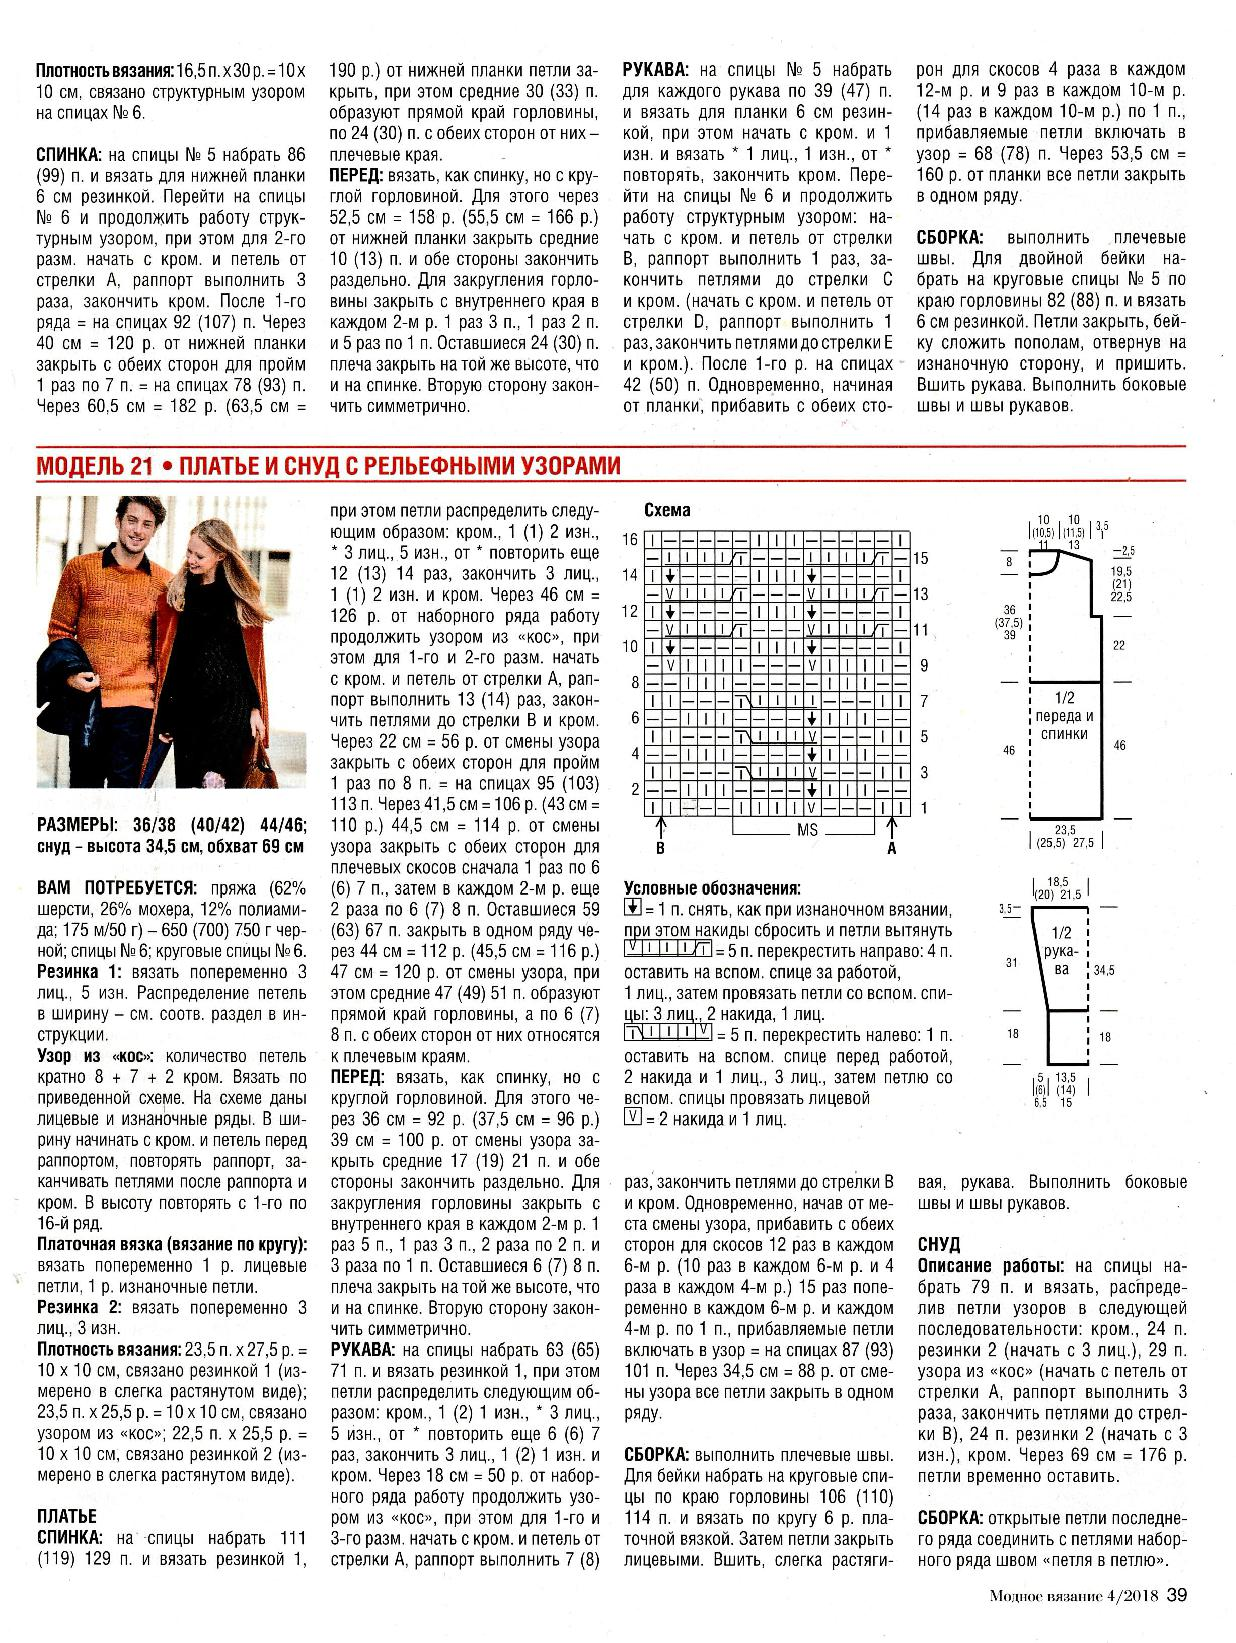 Page_00039.jpg